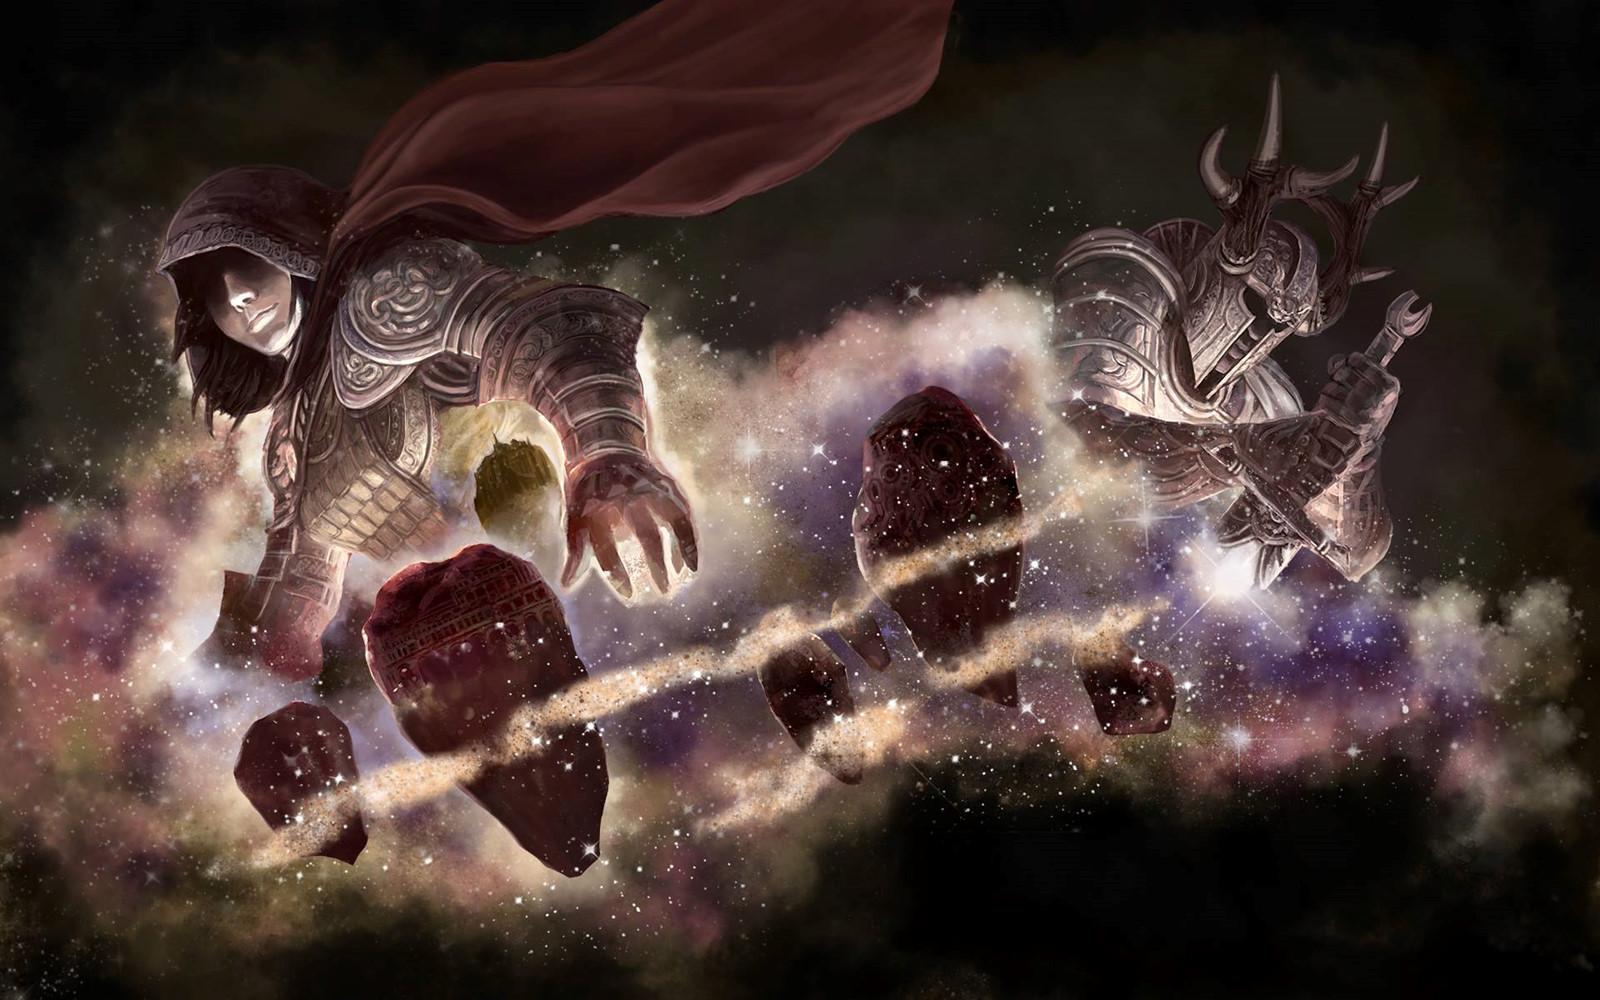 Legends Of Aria chuẩn bị thử nghiệm trên Steam